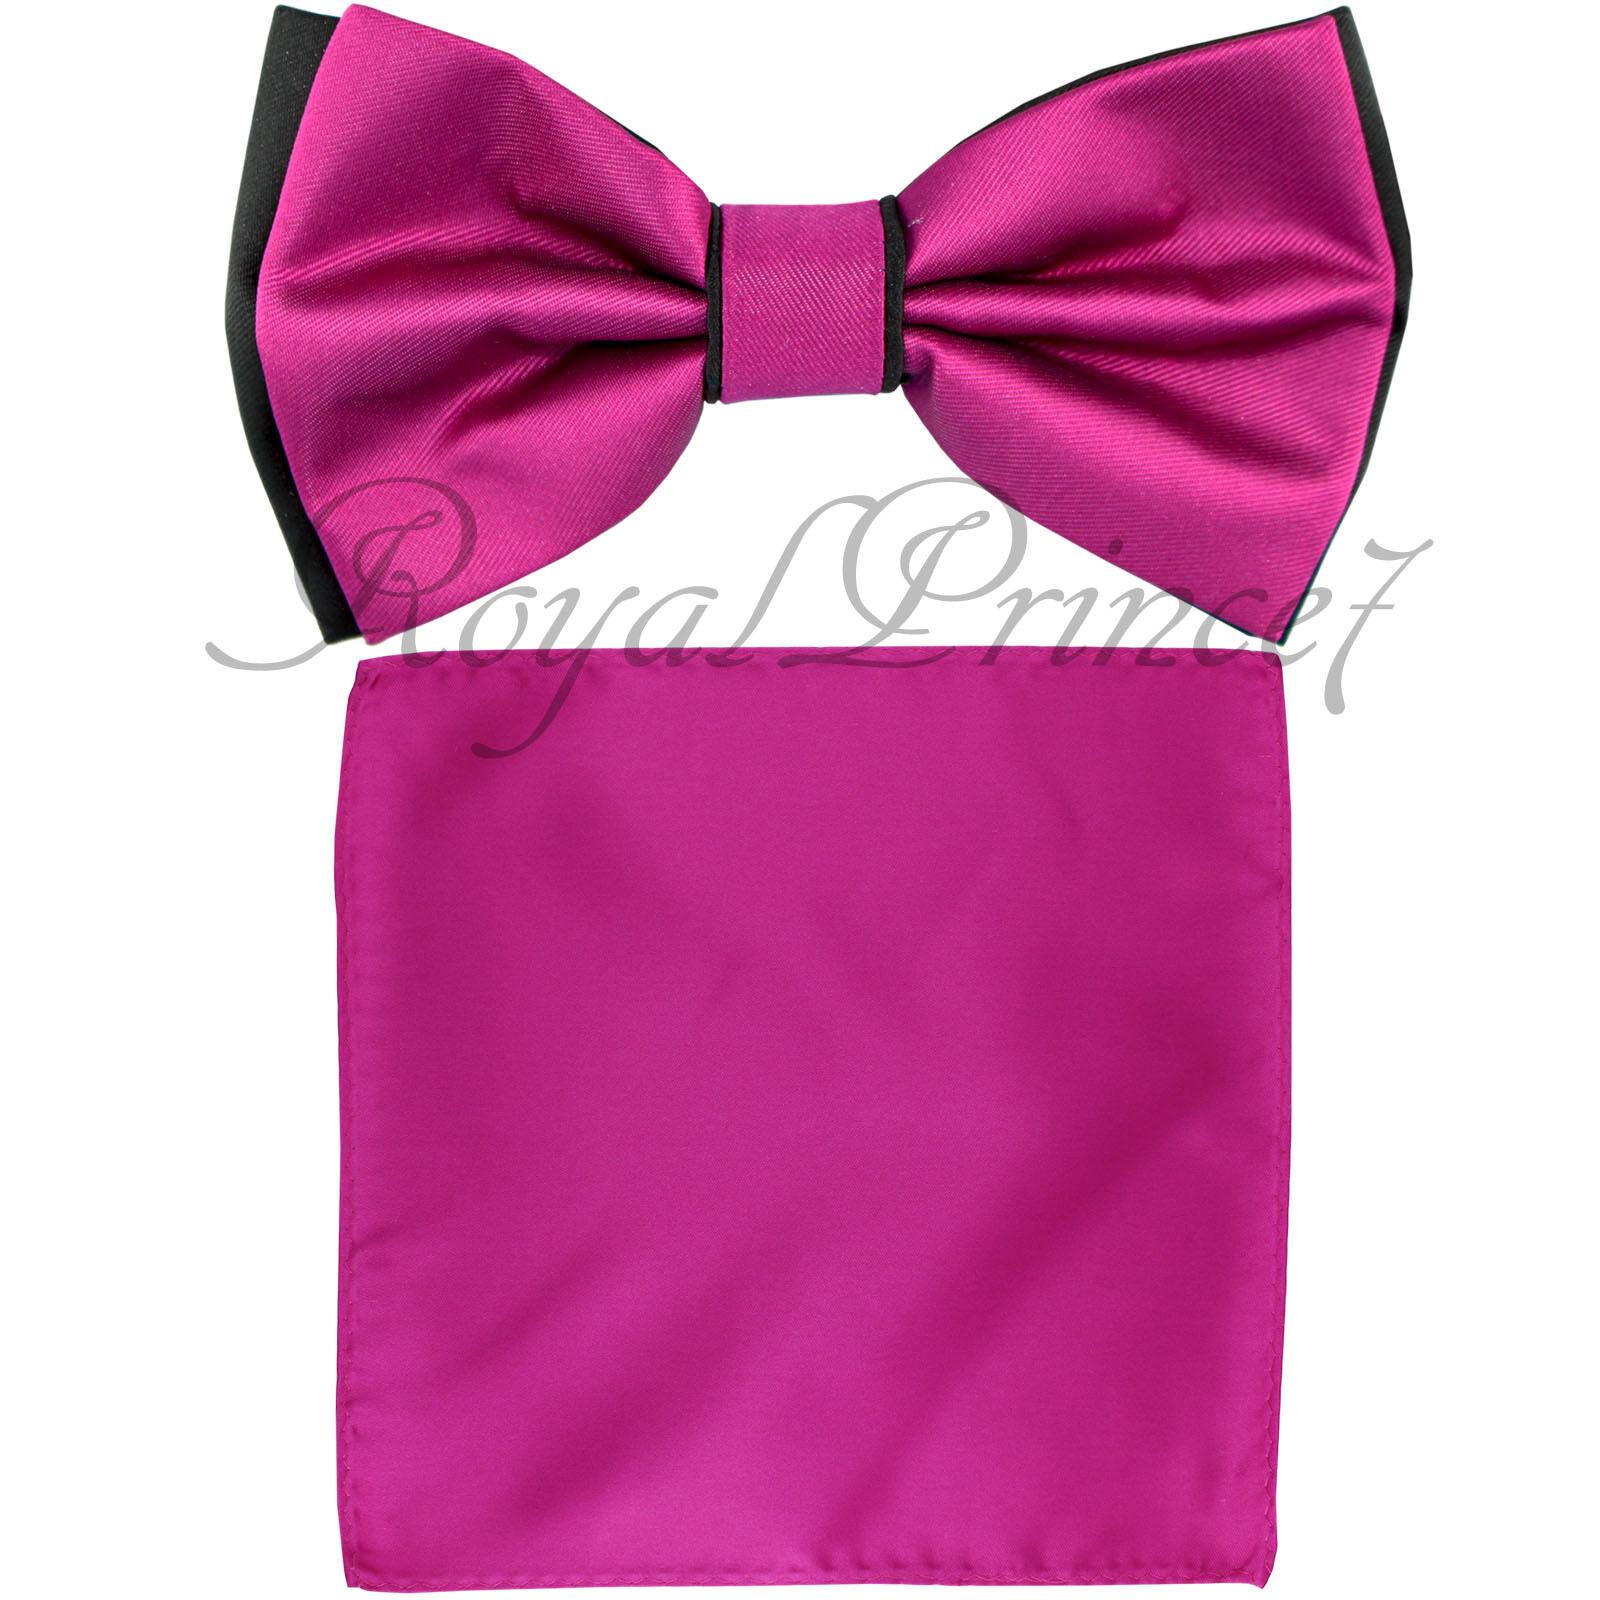 Wedding Black fuchsia vorgebunden Bow Tie & Pocket Square Handkerchief Two